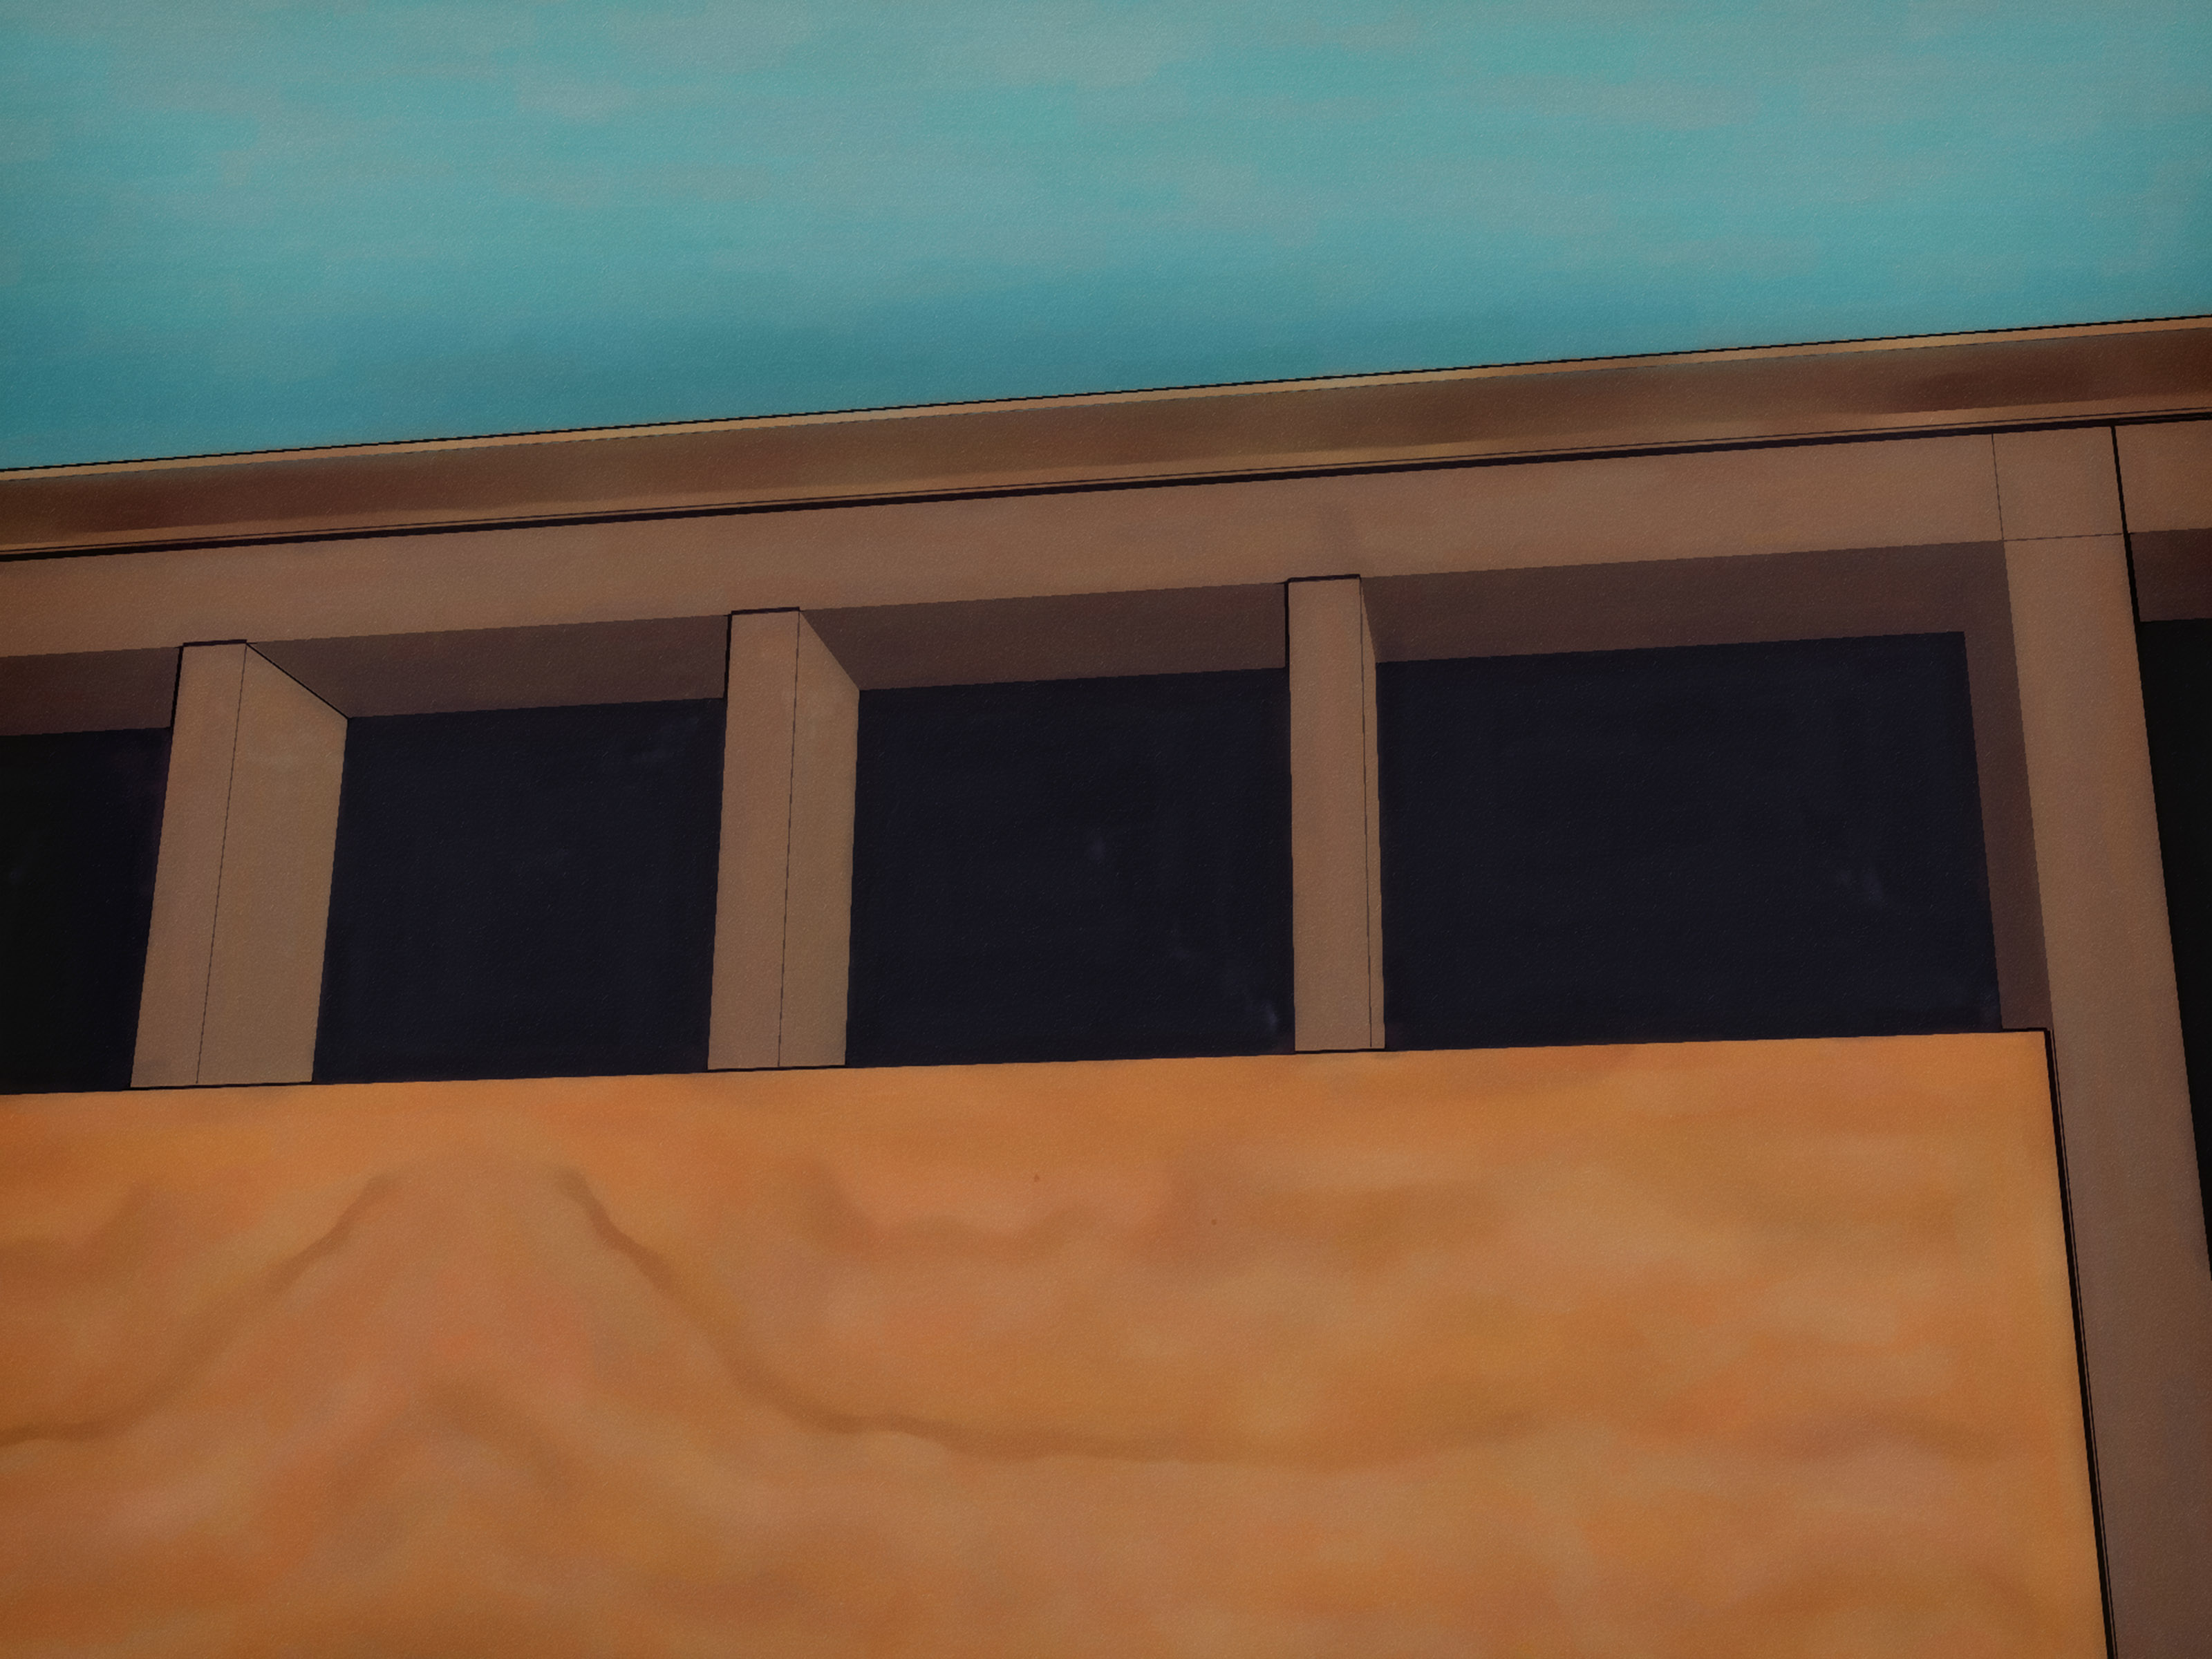 Frame Of Doorway | Framess.co